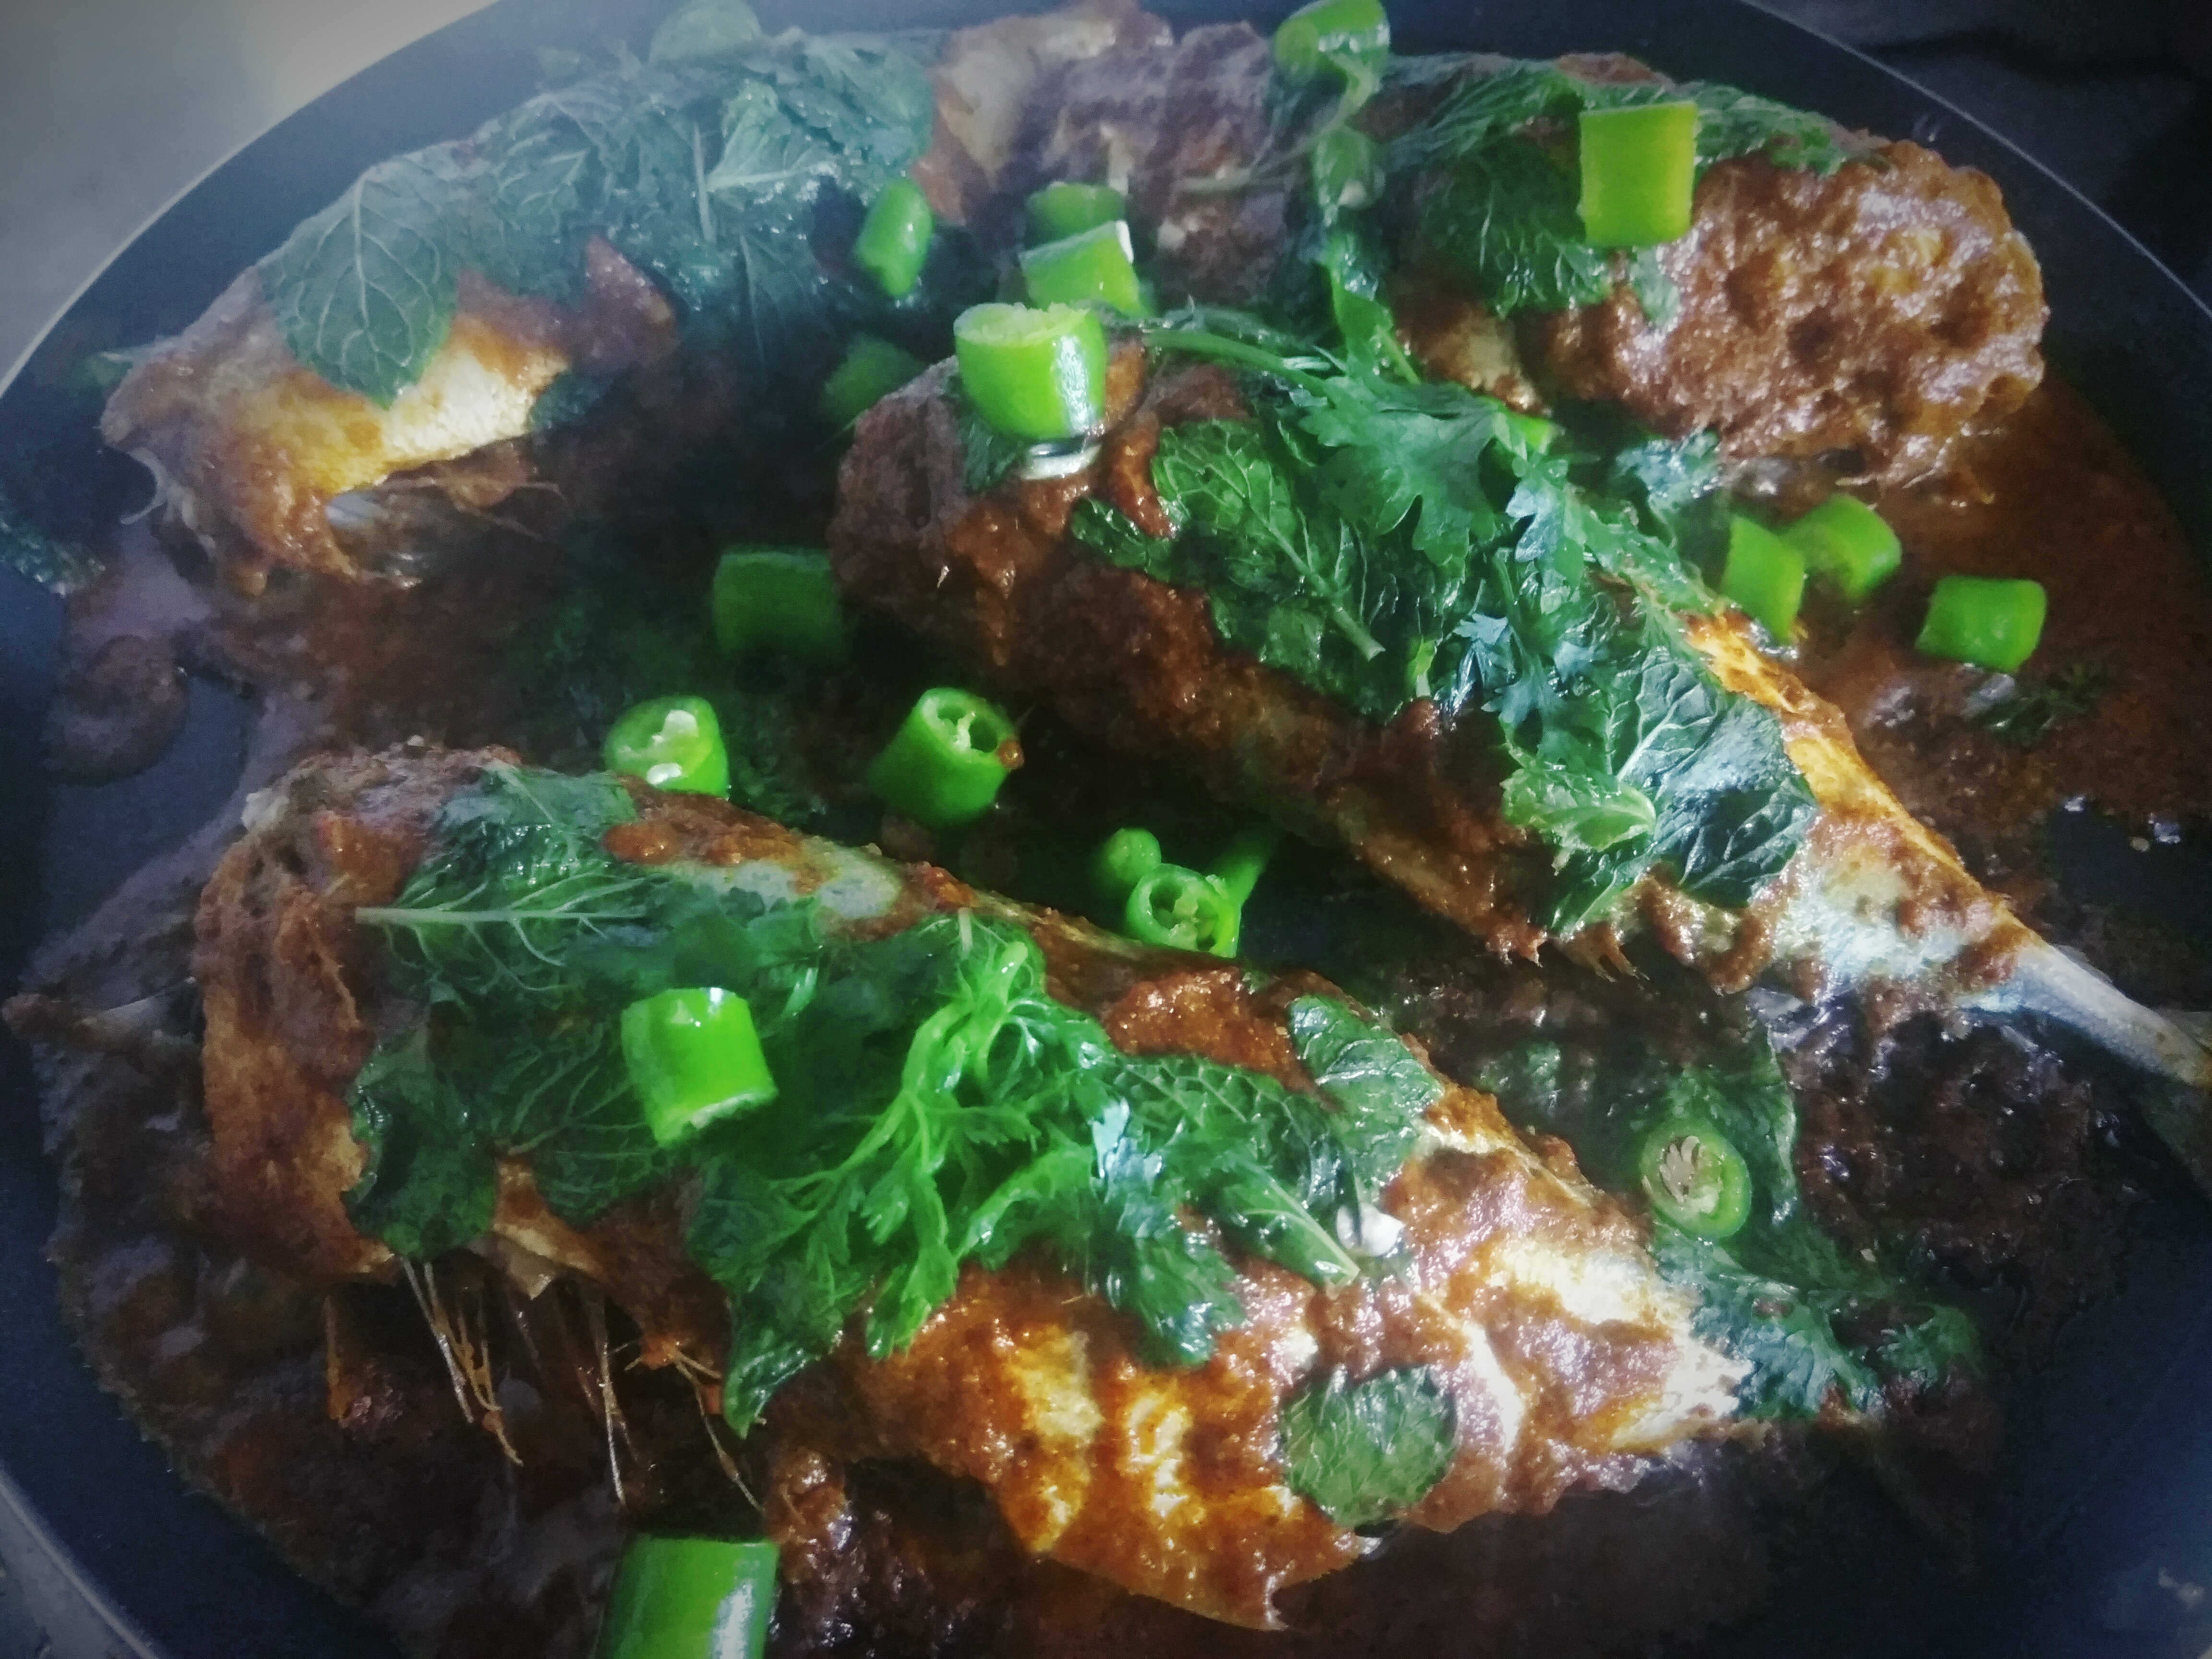 Mackerel fish fry